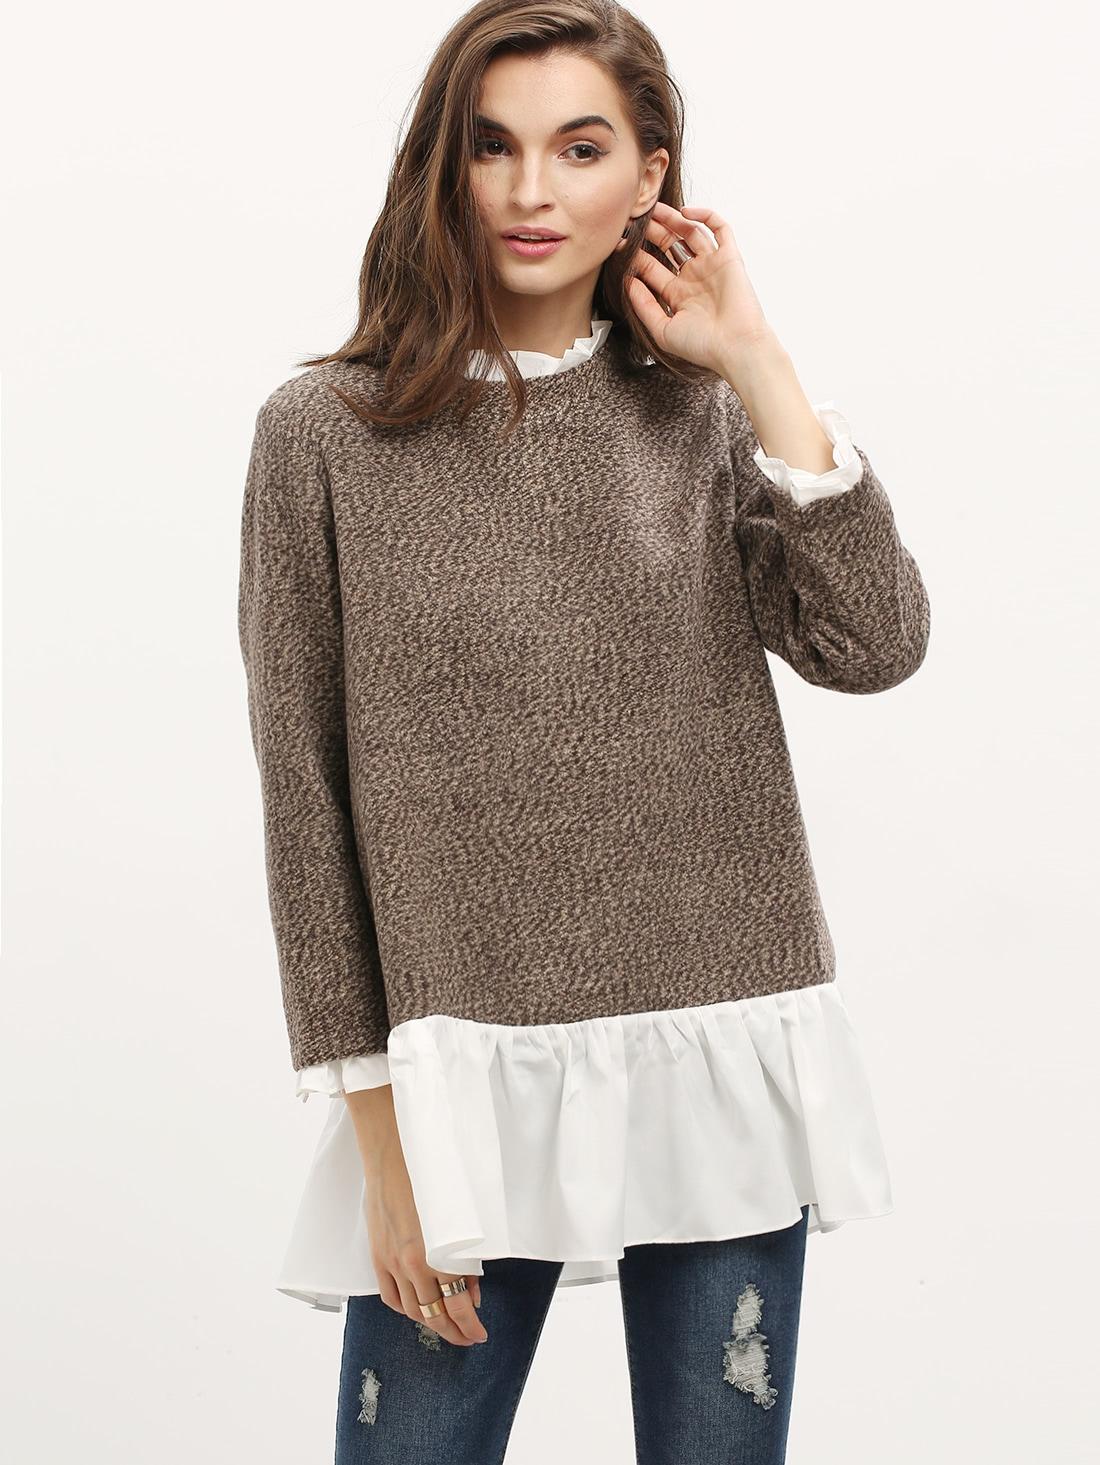 Contrast Frill Neck And Hem Sweater -SheIn(Sheinside)